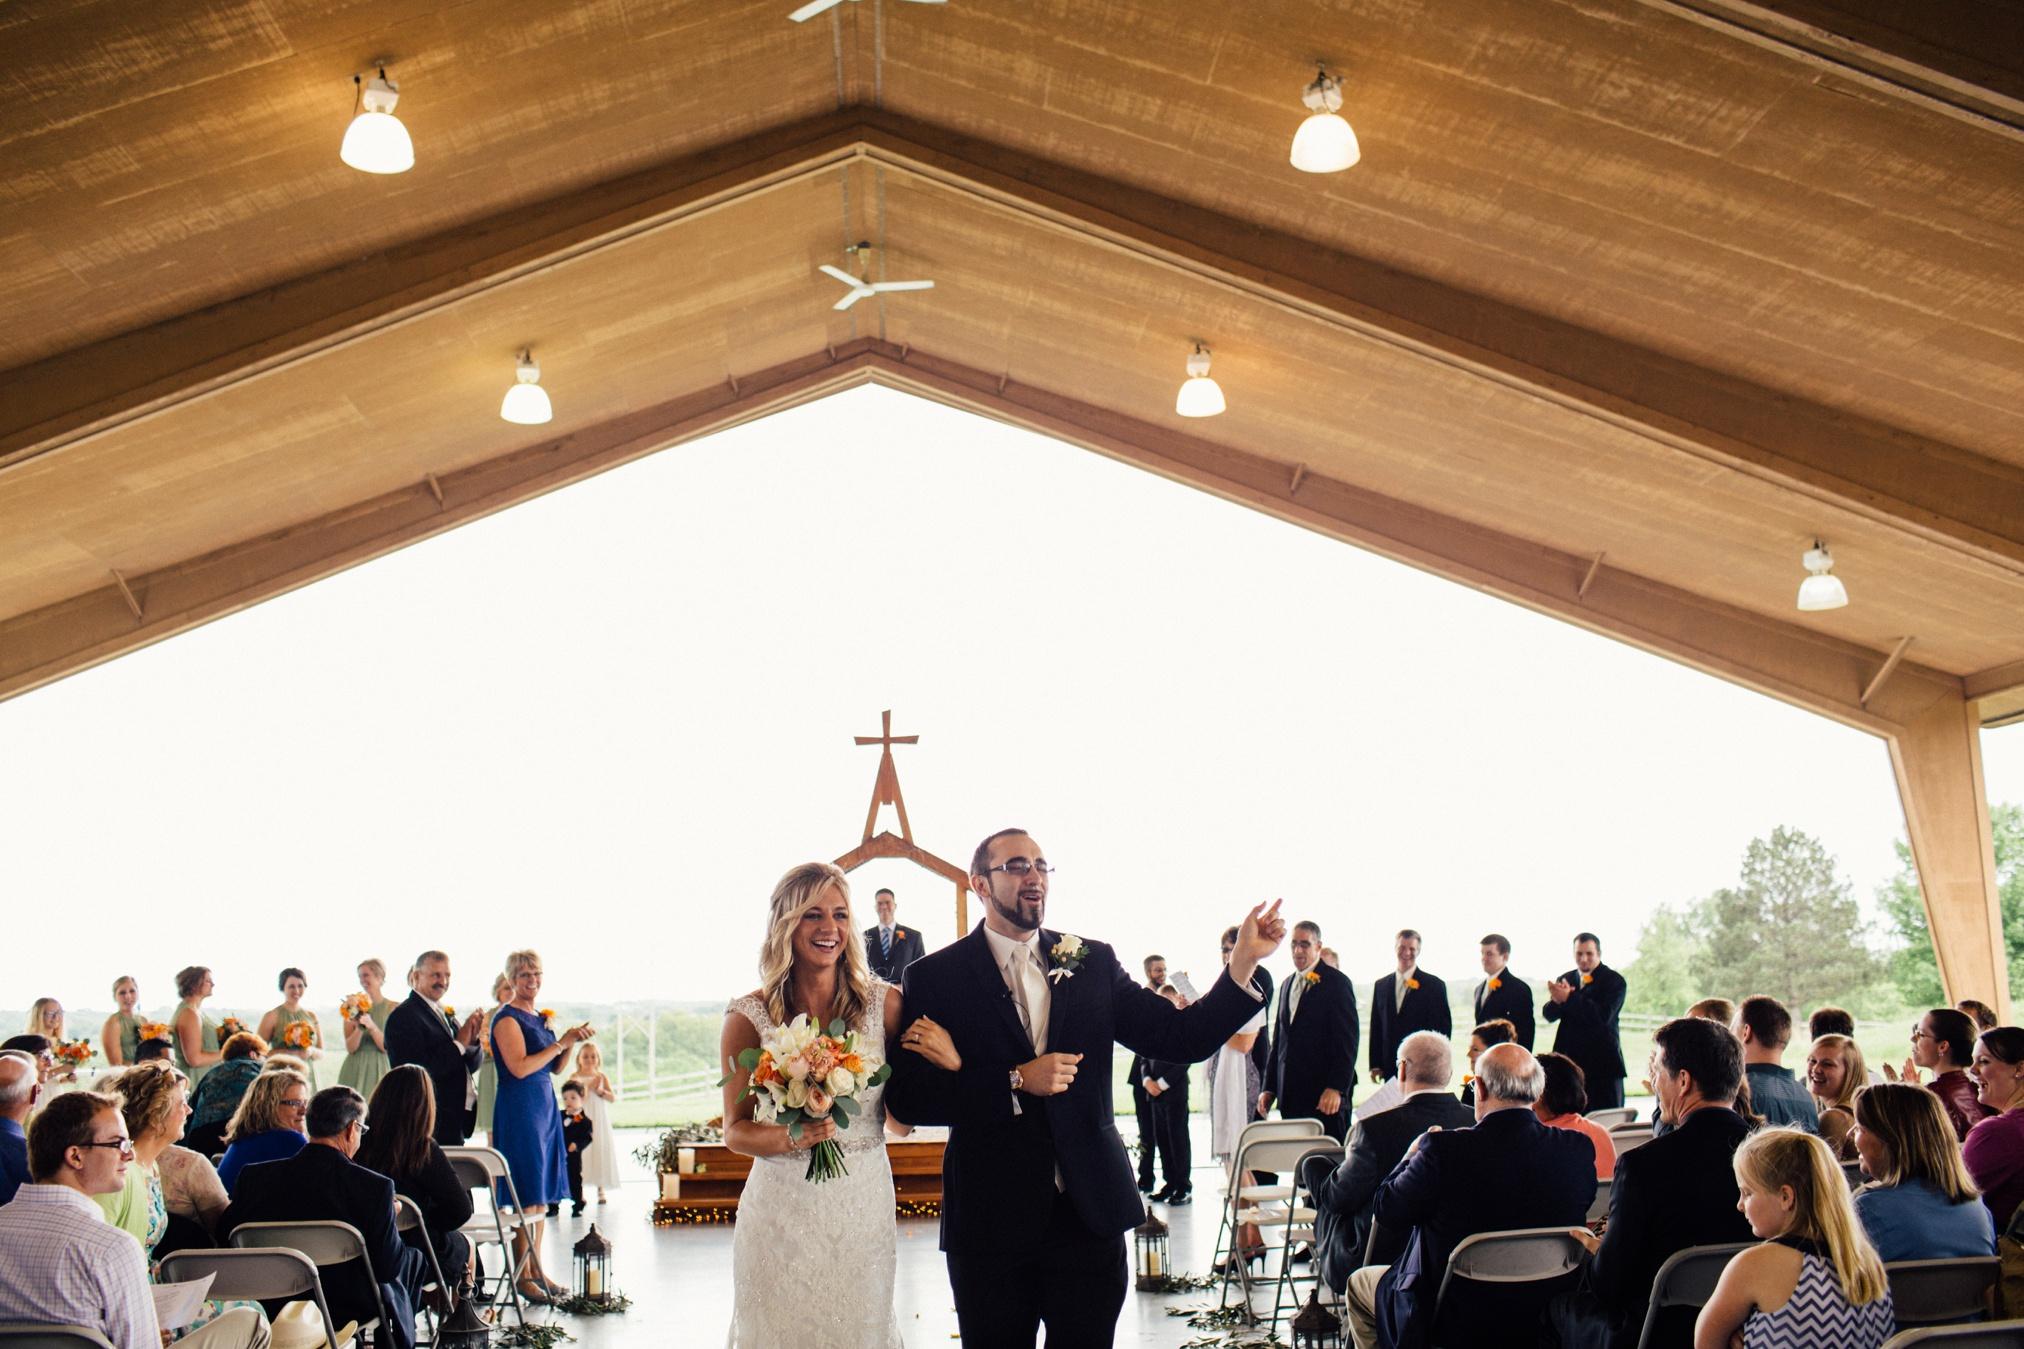 schmid_wedding-569.jpg